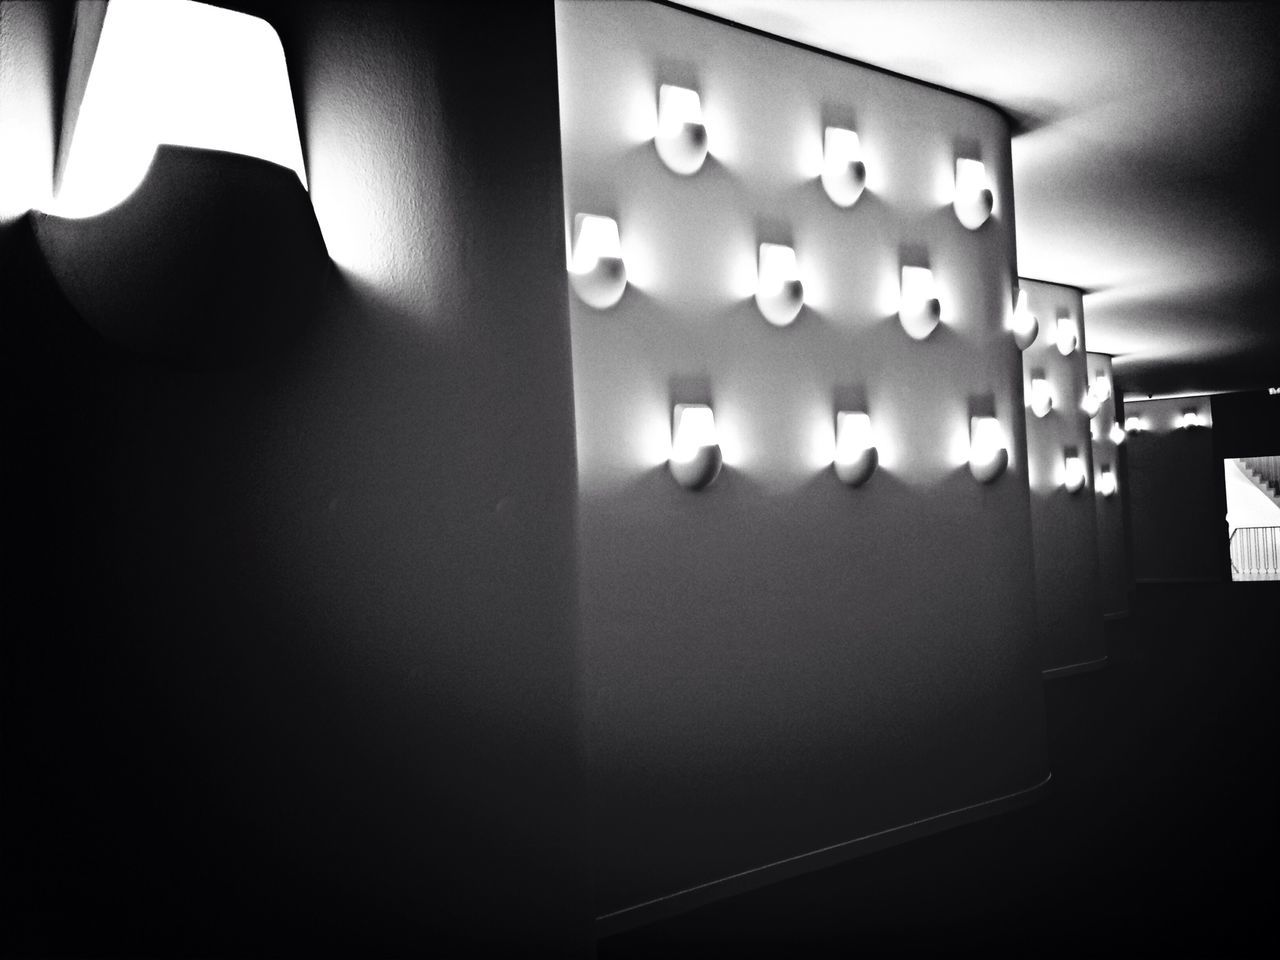 Monochrome Lights Fifties B/w Daily